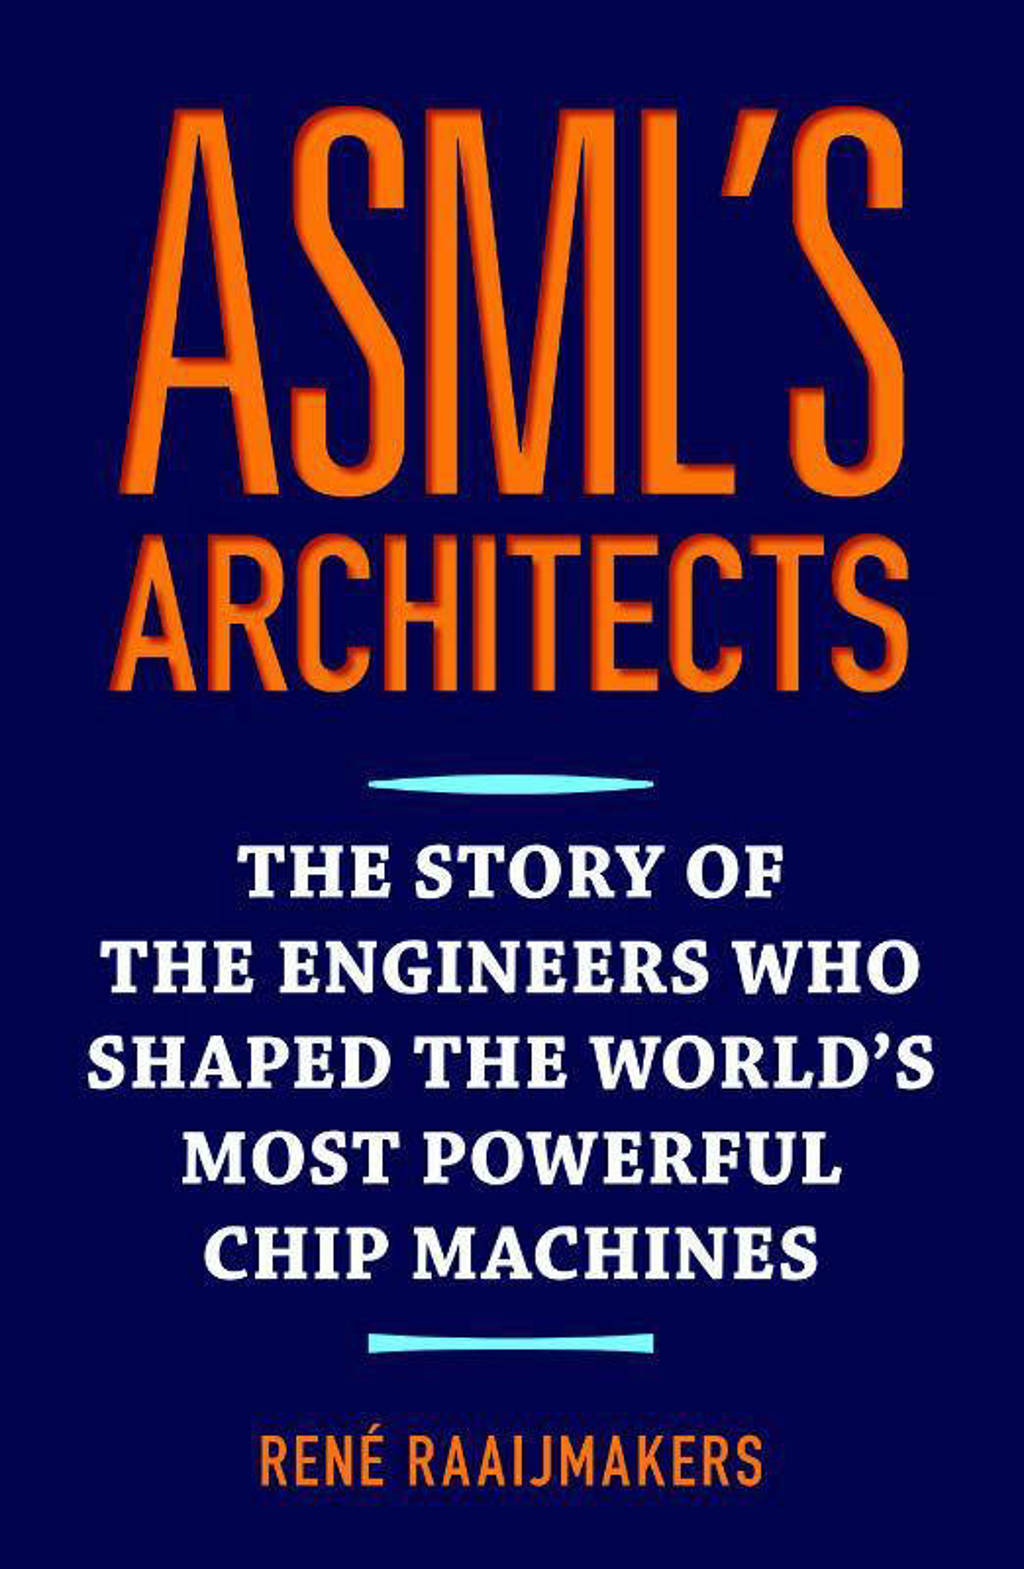 ASML's architects - René Raaijmakers